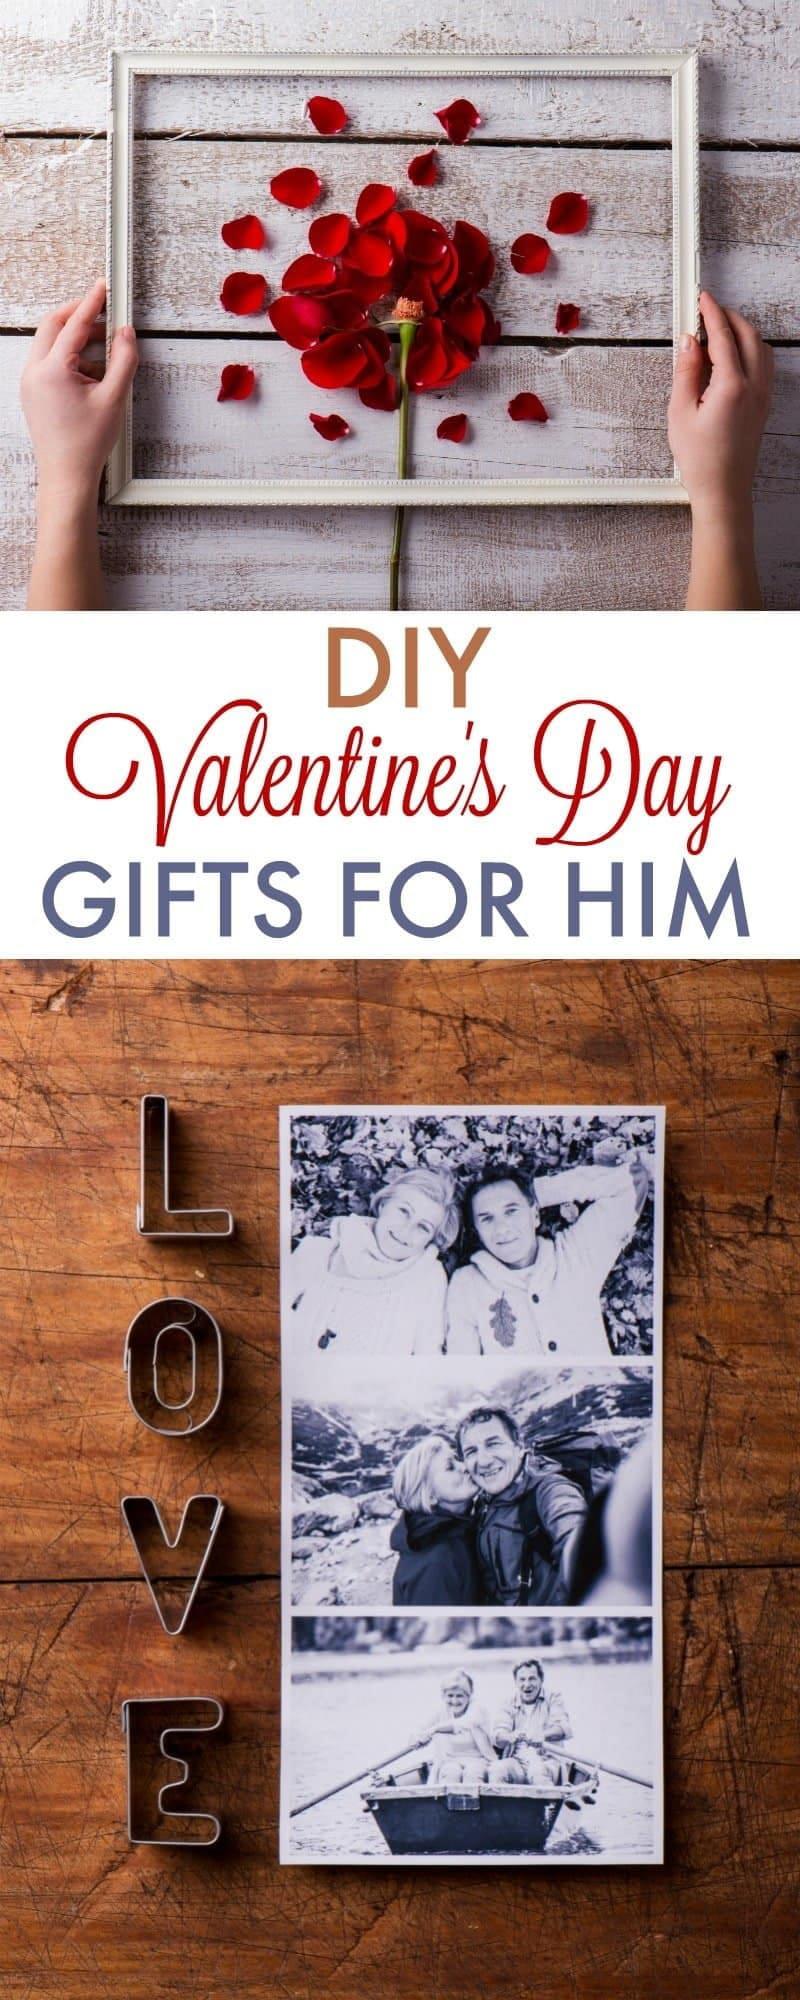 Valentines Day Gift Ideas For Husband  DIY Valentine s Day Gifts for Boyfriend 730 Sage Street